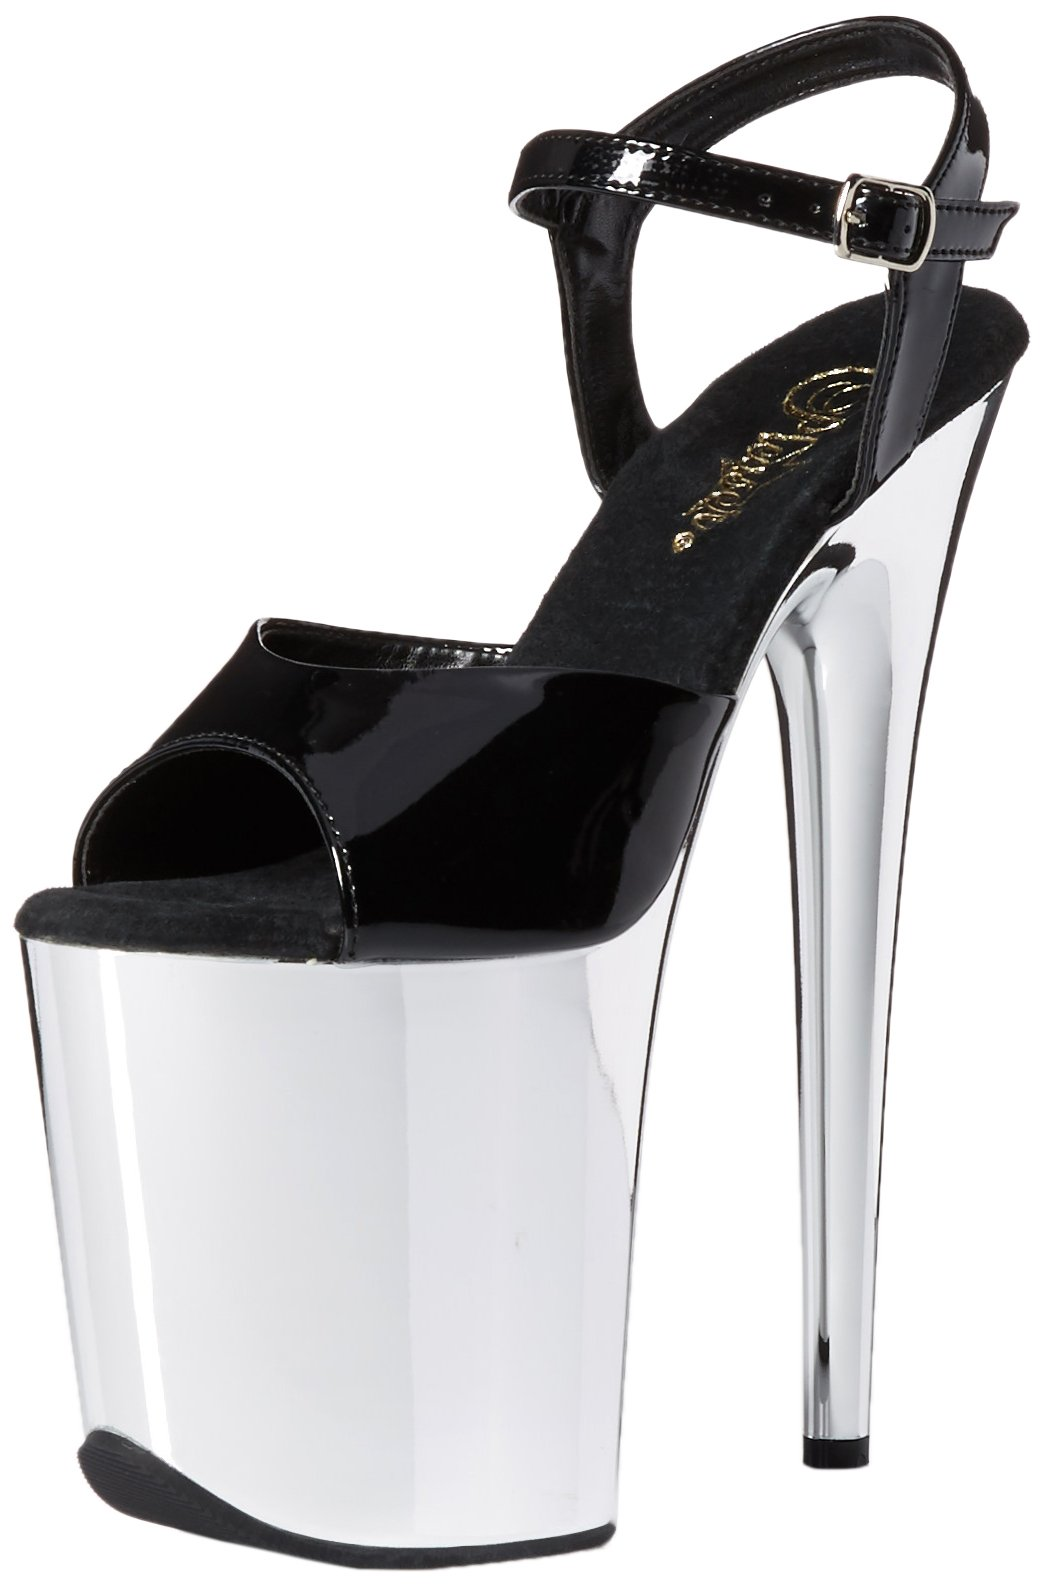 Pleaser FLAM809/B/SCH Women's Platform Dress Sandal, Black Patent/Silver Chrome, 8 M US